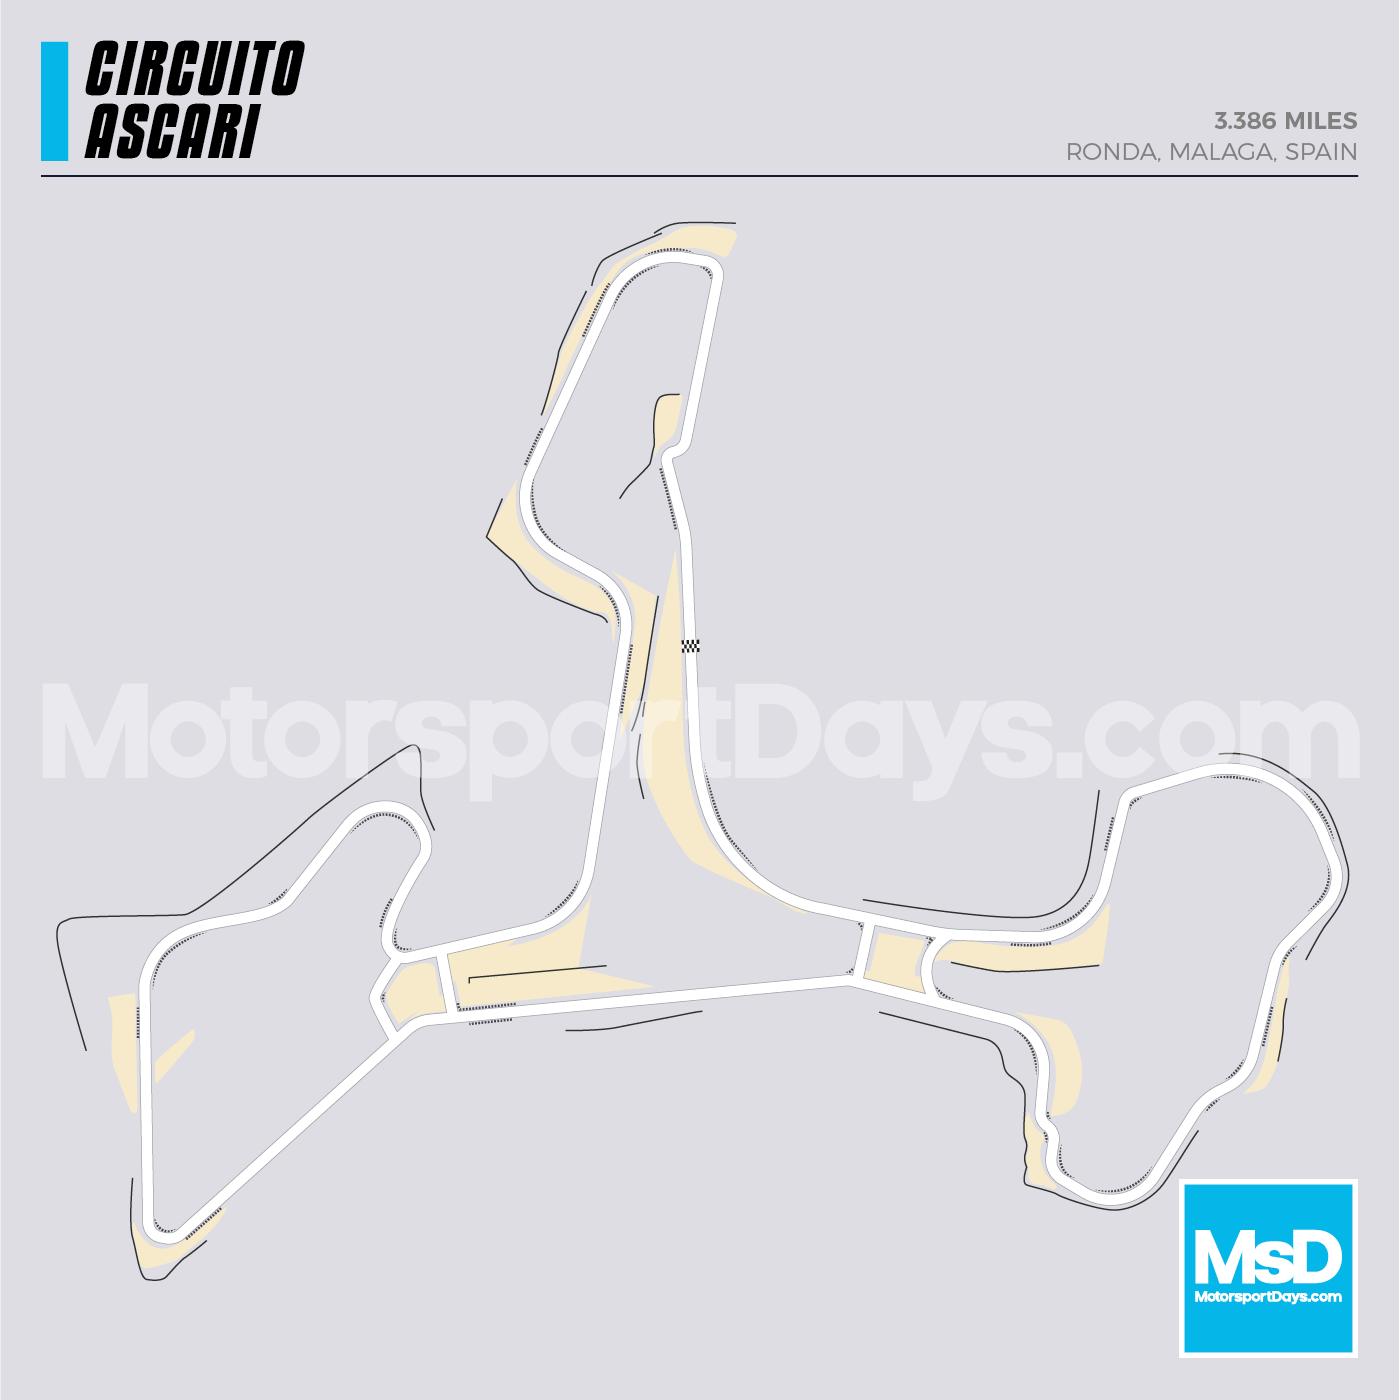 Ascari-Circuit-track-map